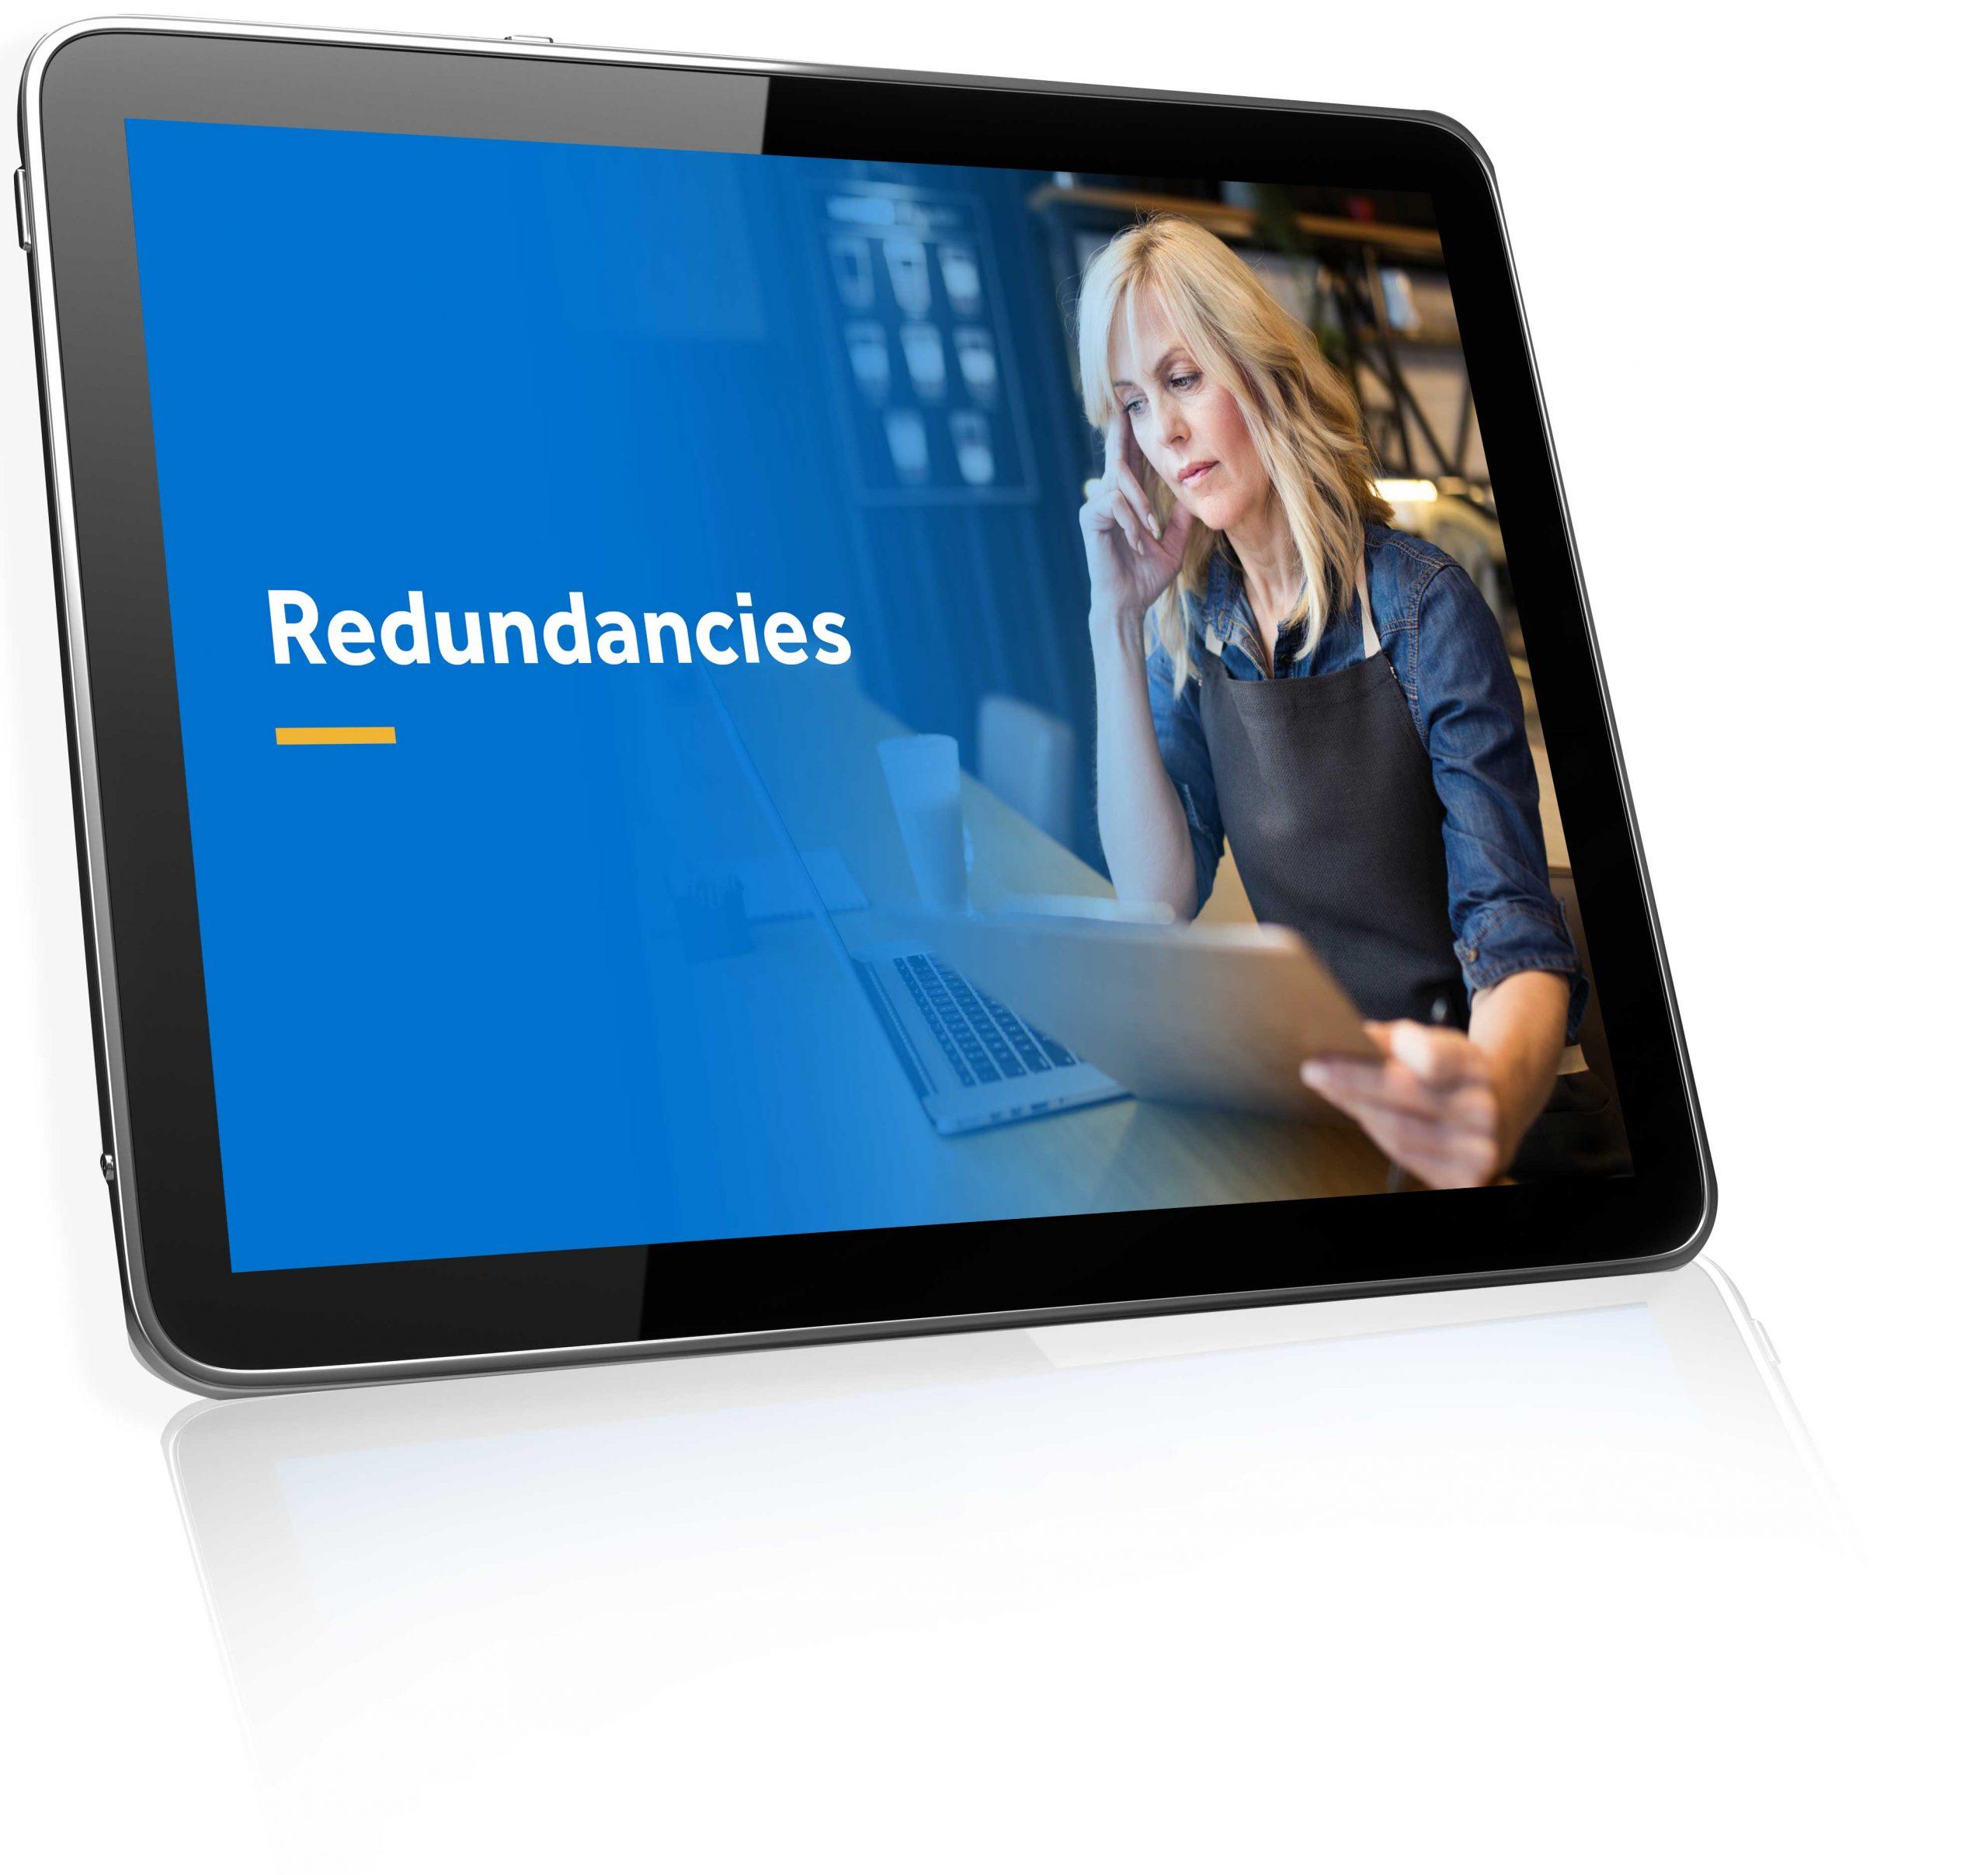 redundancies nz guide